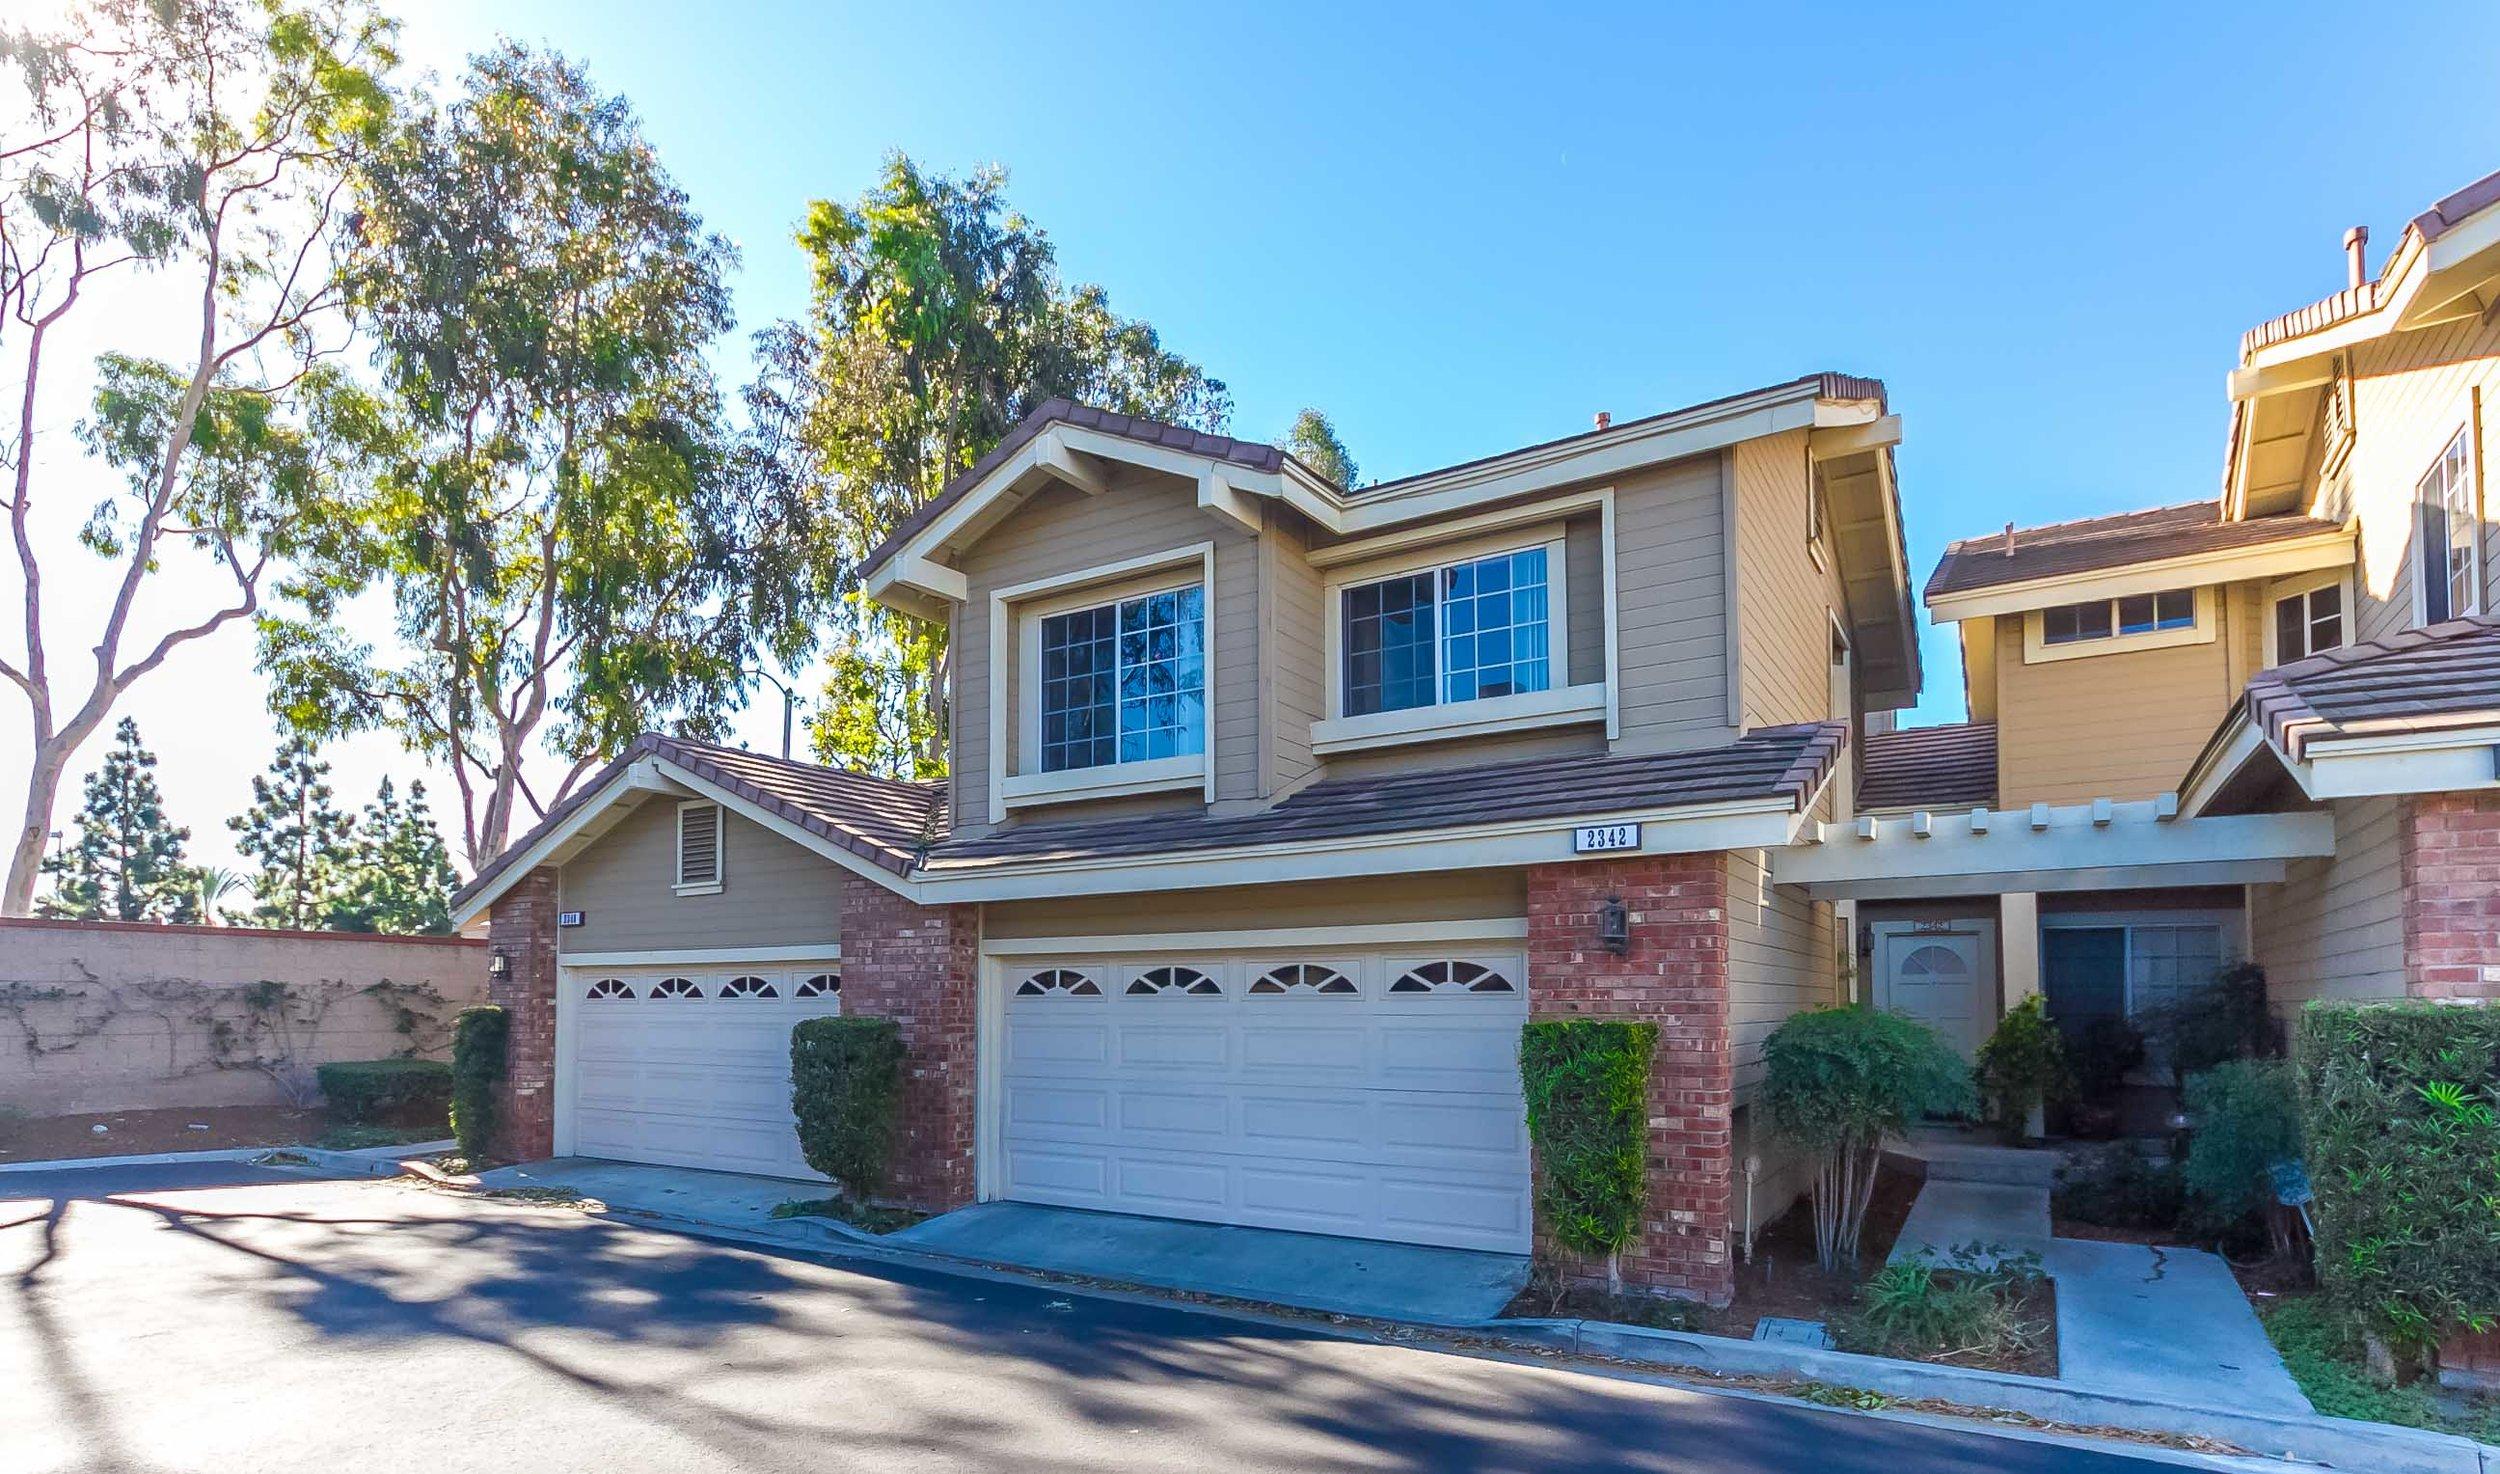 2342 Redwood #80 - $555,000